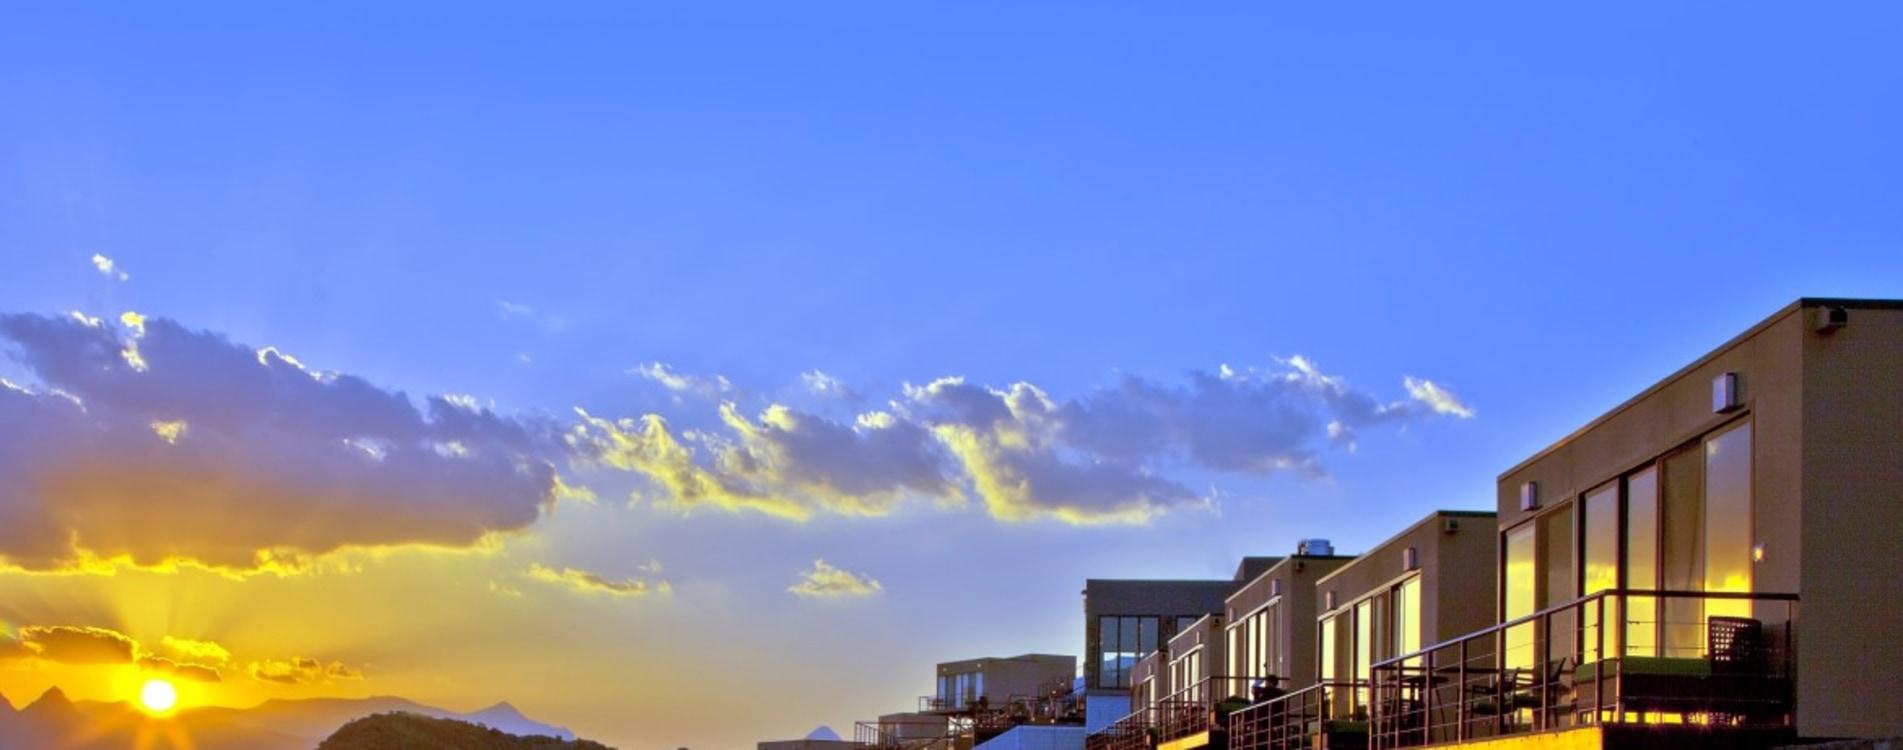 The-View-Oman-Exterior-Hotelkomplex.jpg